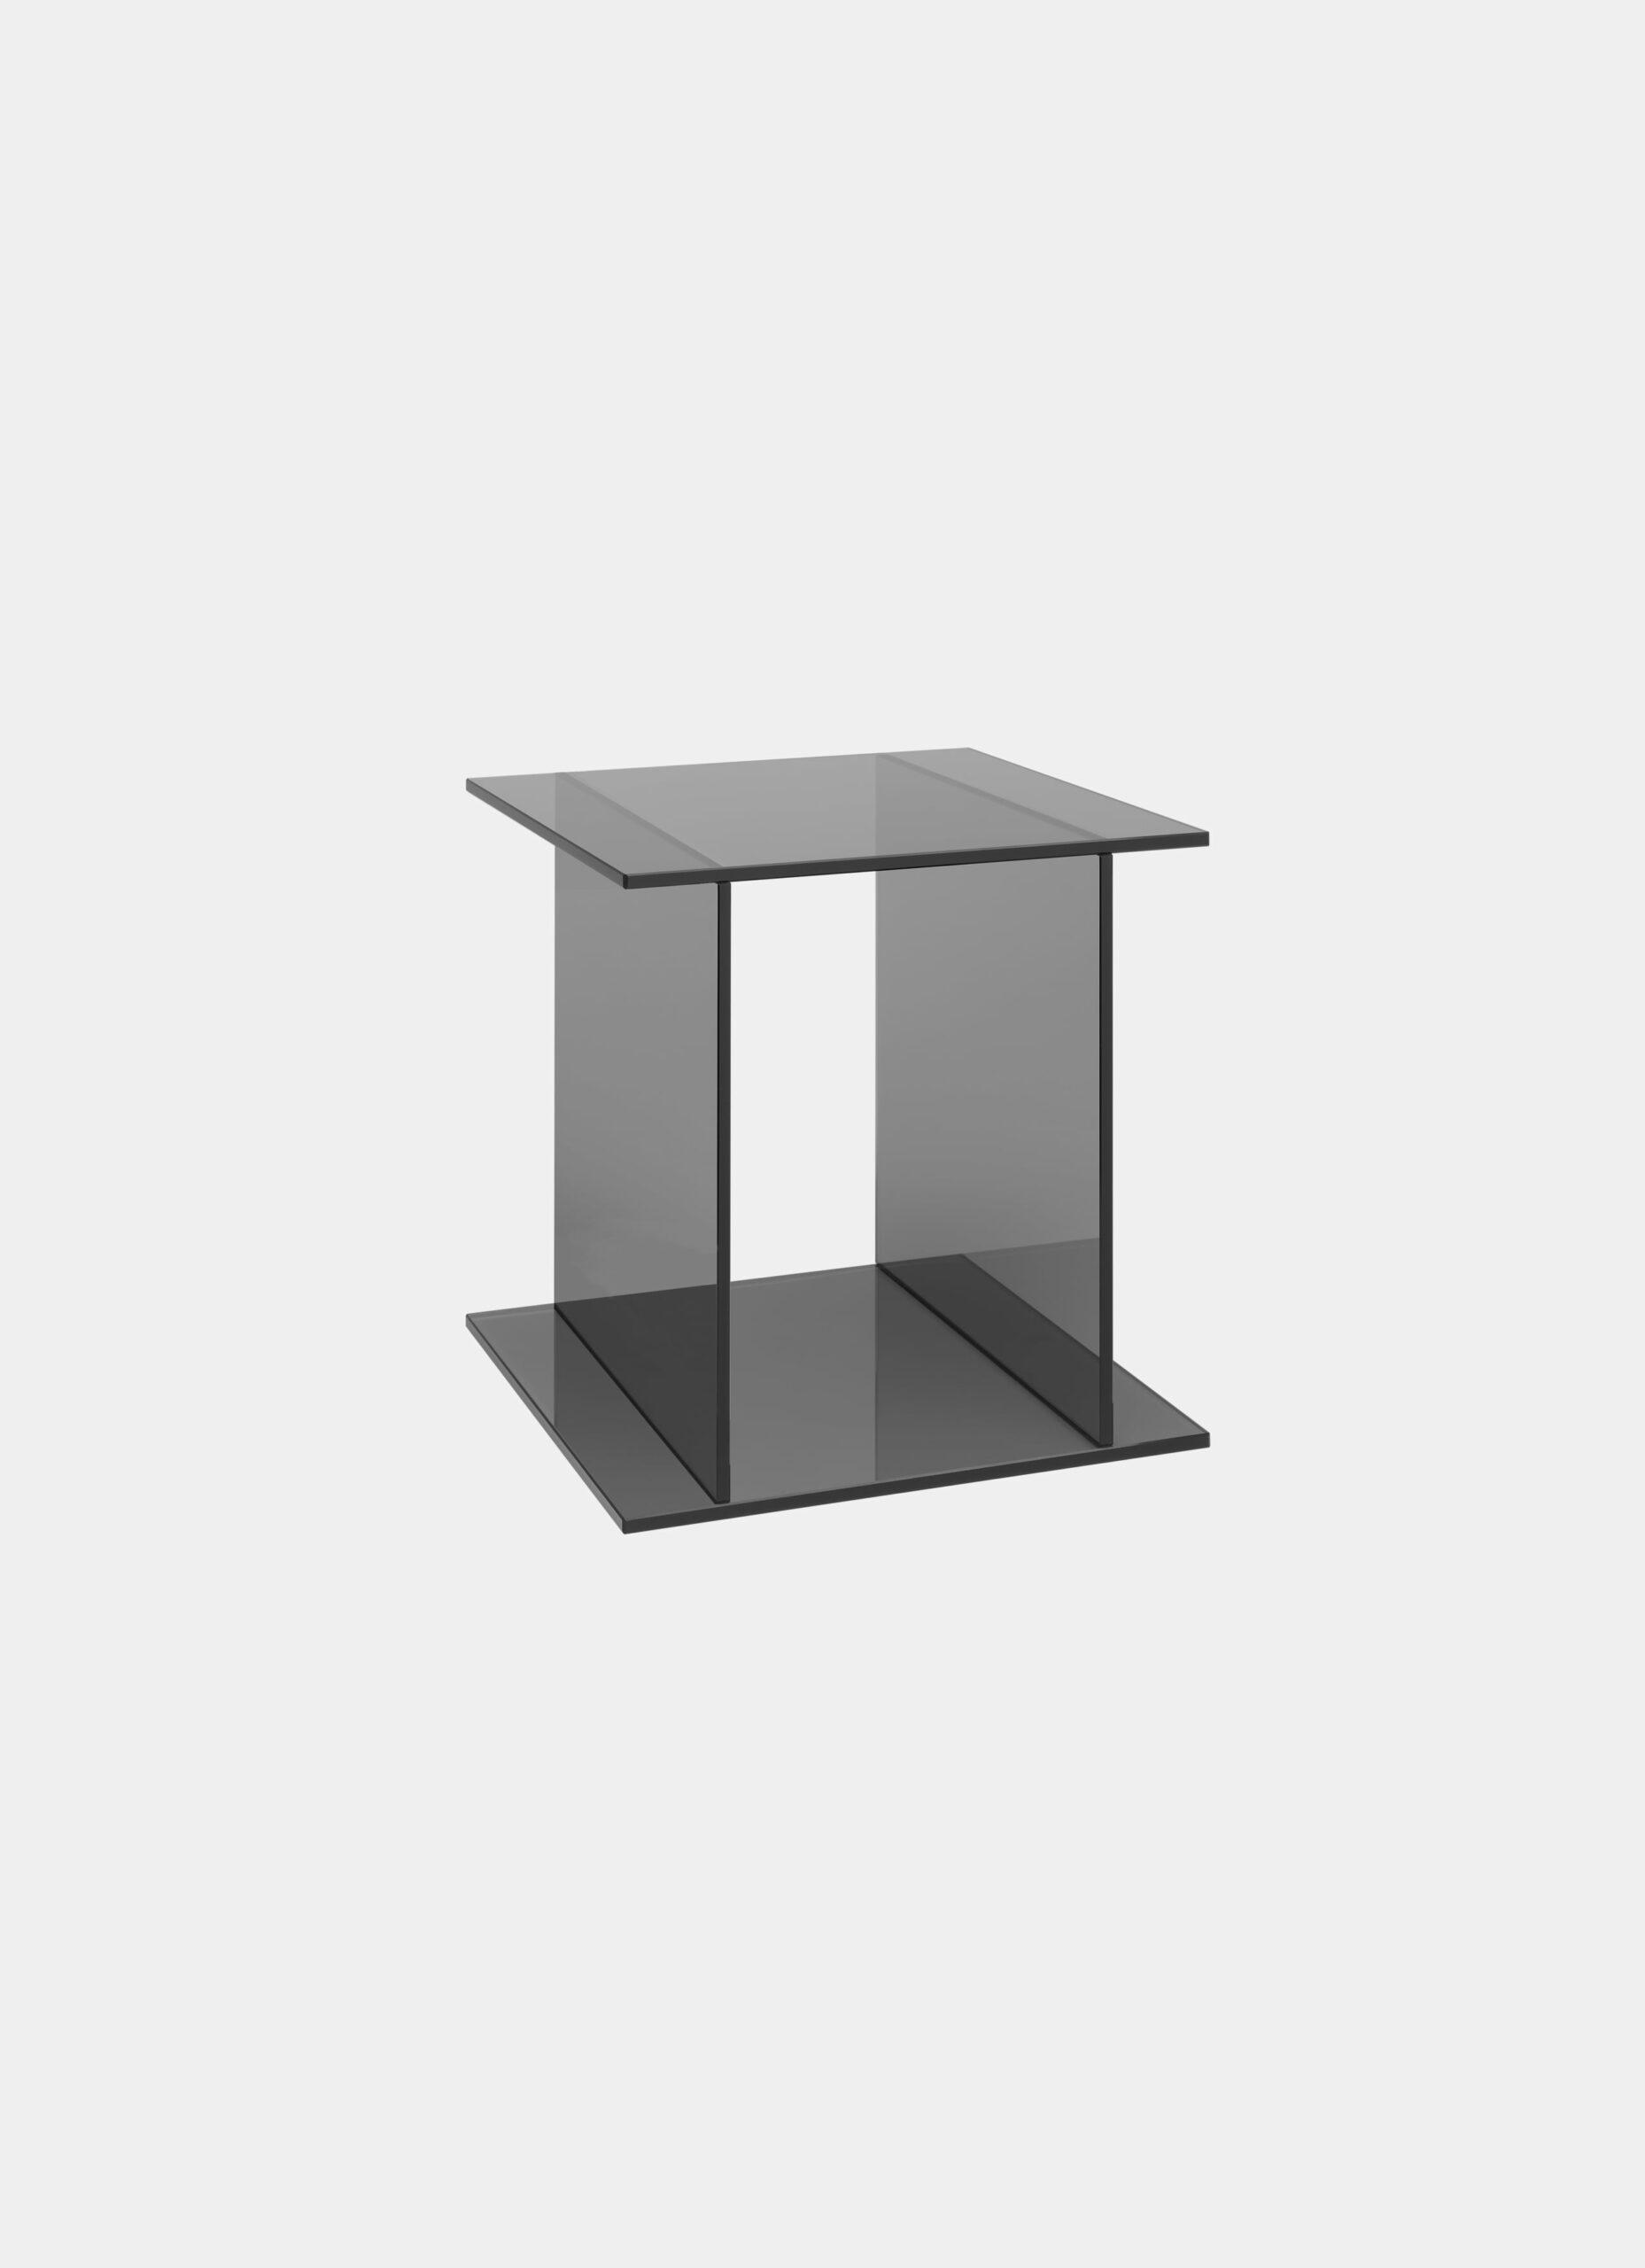 e15 - Philipp Mainzer - Drei - Glass side table